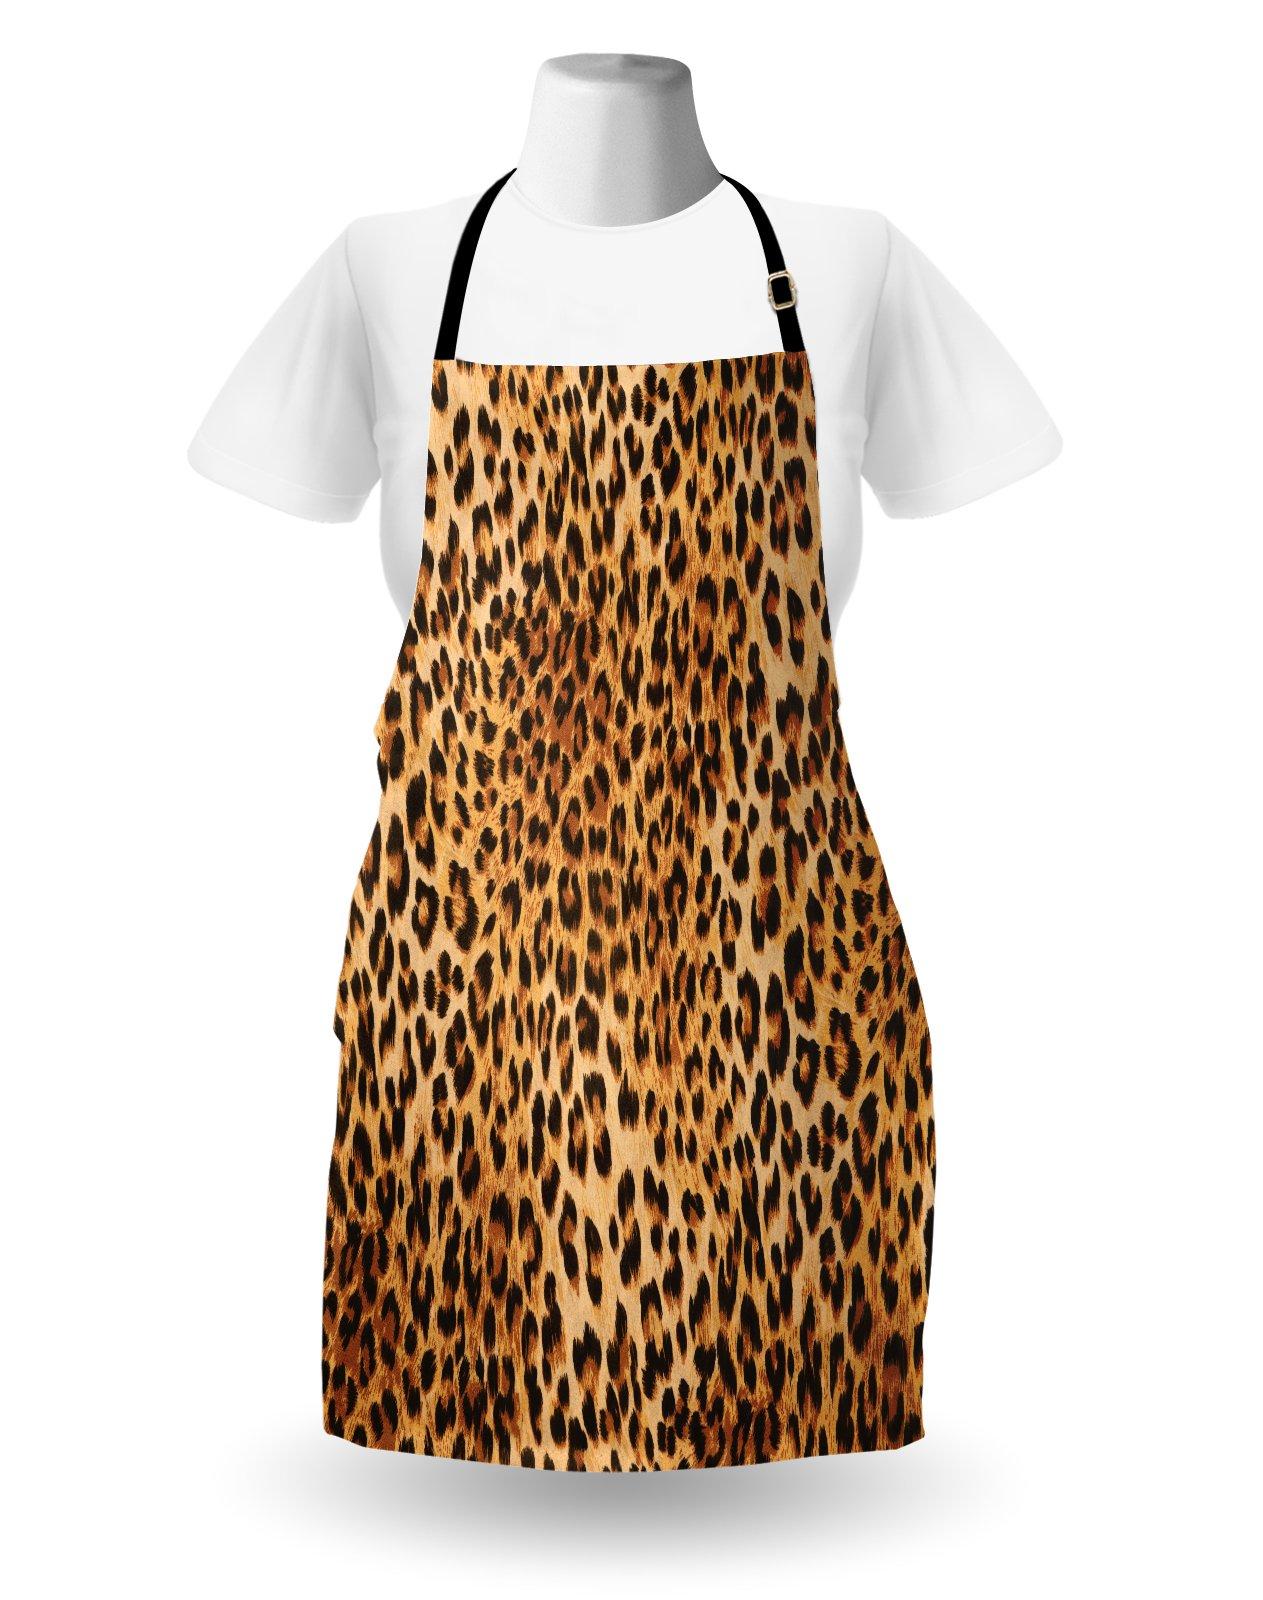 Lunarable Animal Print Apron, Wild Animal Leopard Skin Pattern Wildlife Nature Inspired Modern Illustration, Unisex Kitchen Bib Apron with Adjustable Neck for Cooking Baking Gardening, Sand Brown by Lunarable (Image #2)